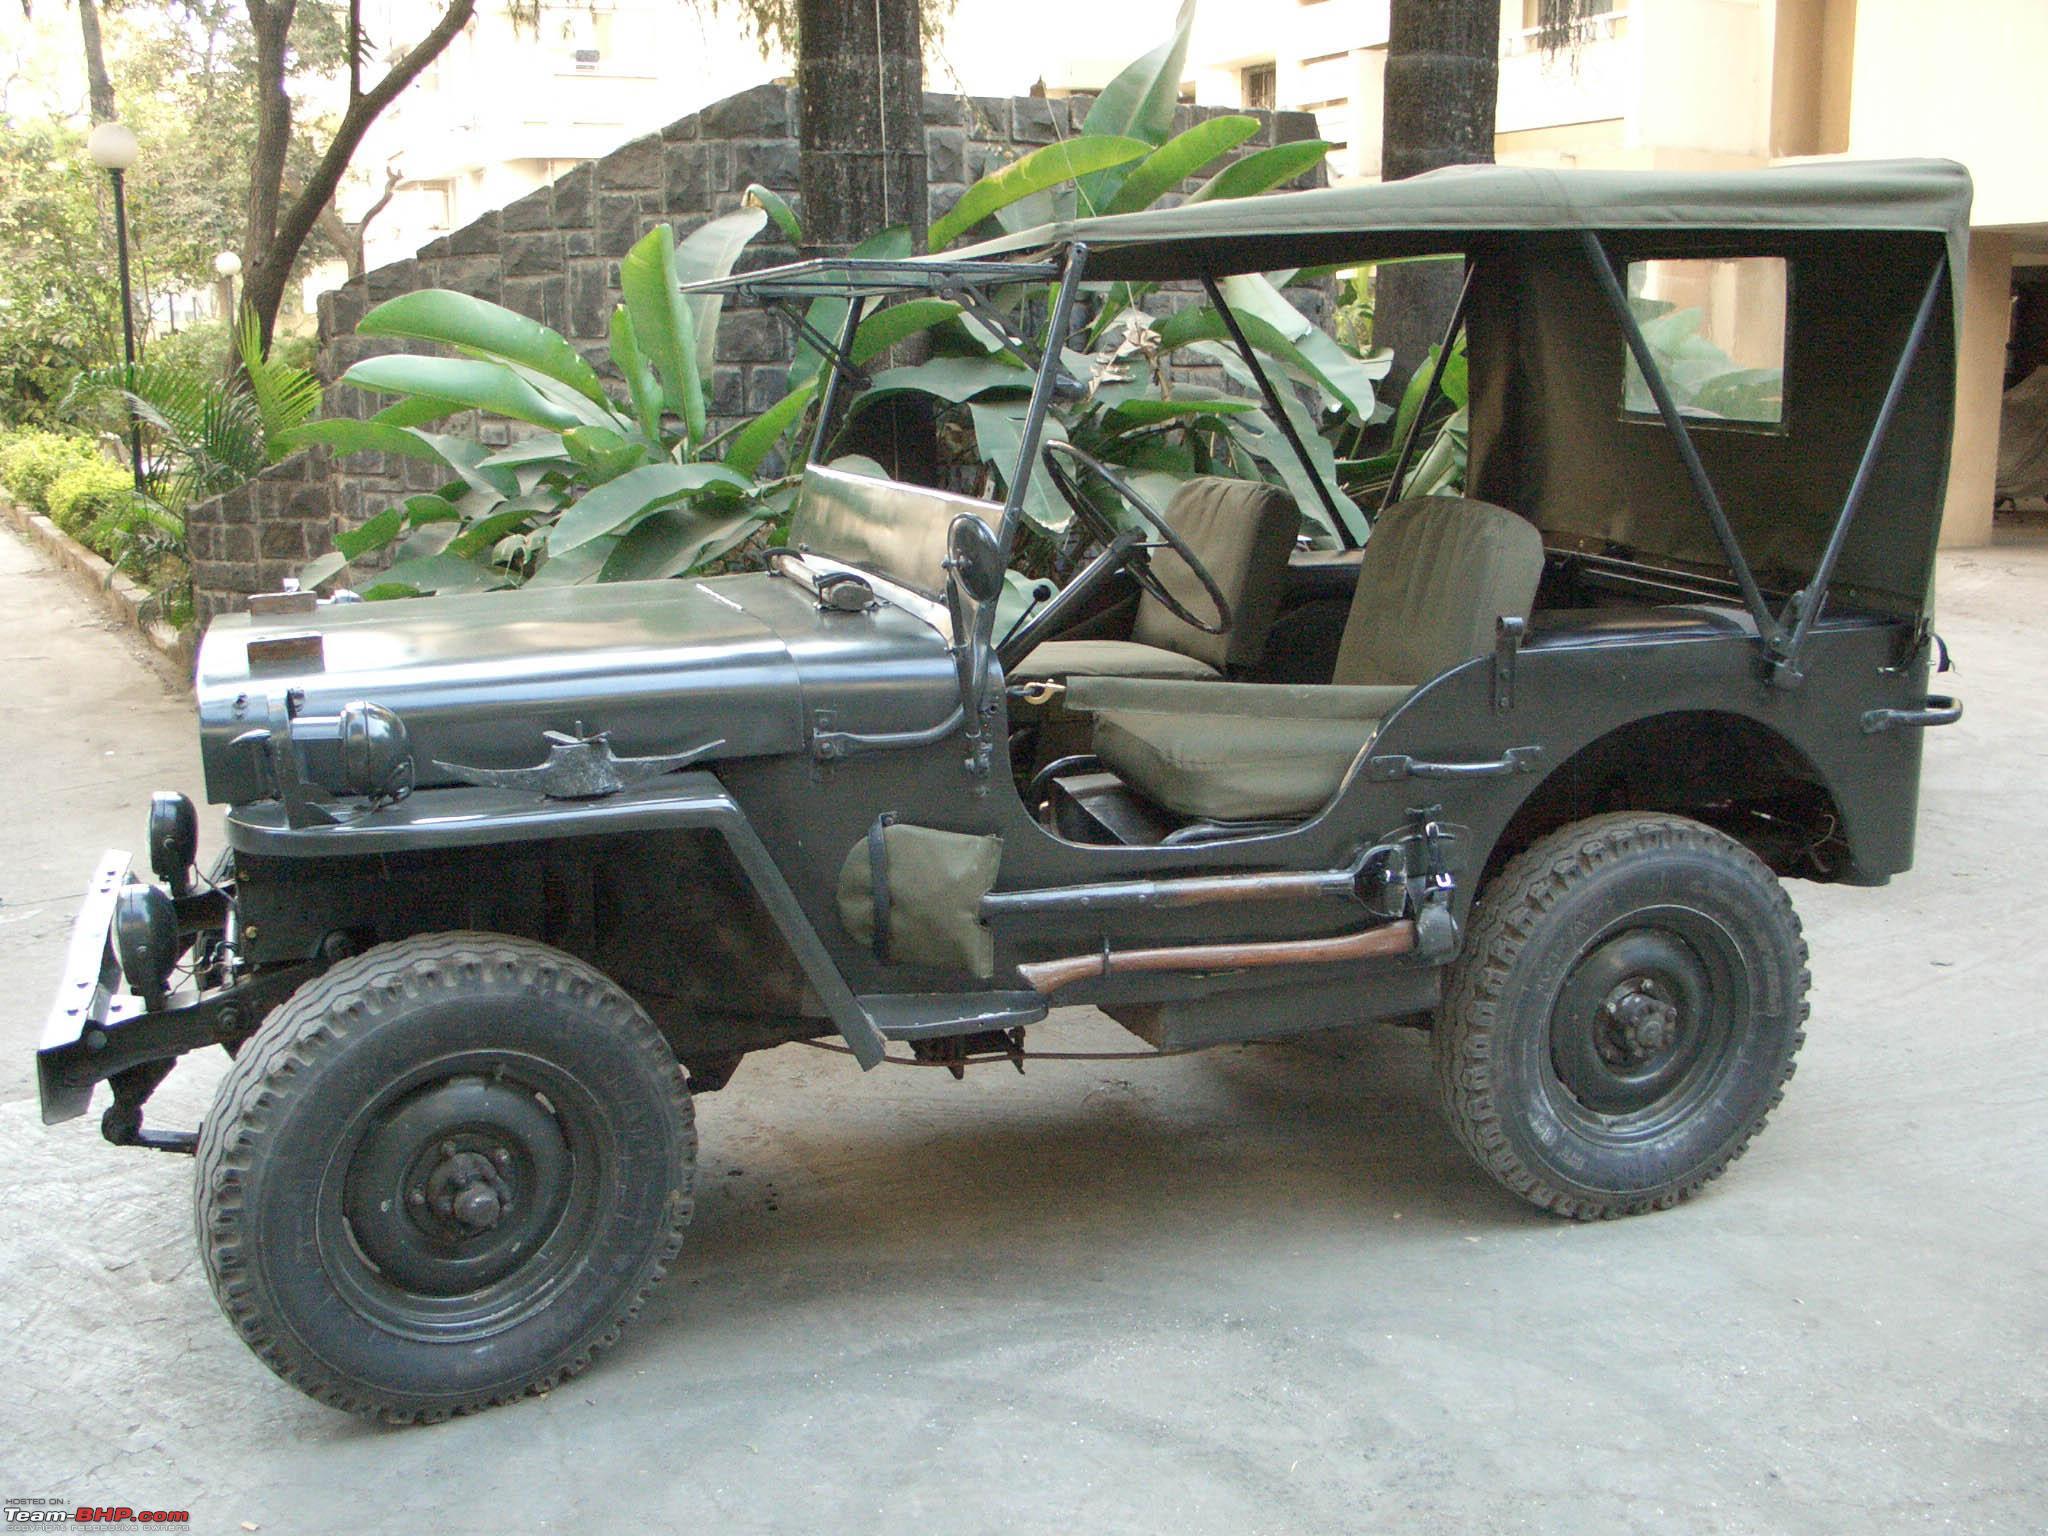 Ford World War ii Jeep 4x4 in